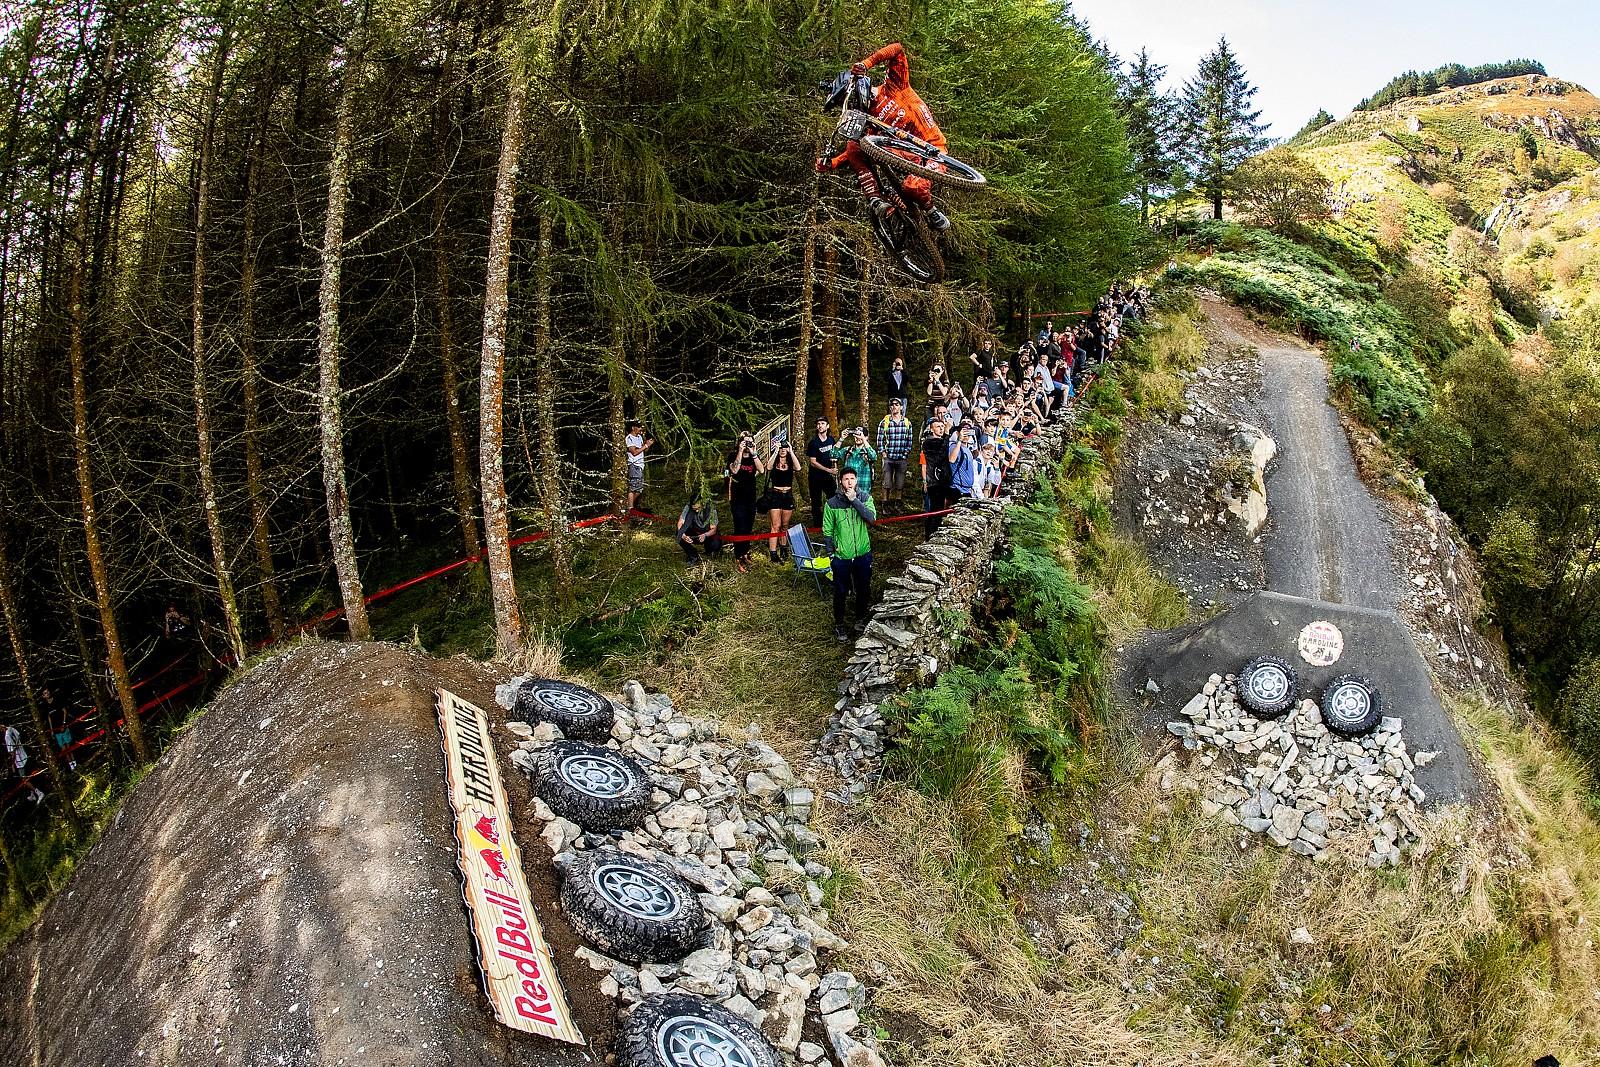 Charlie Hatton - Red Bull Hardline in Photos - Mountain Biking Pictures - Vital MTB